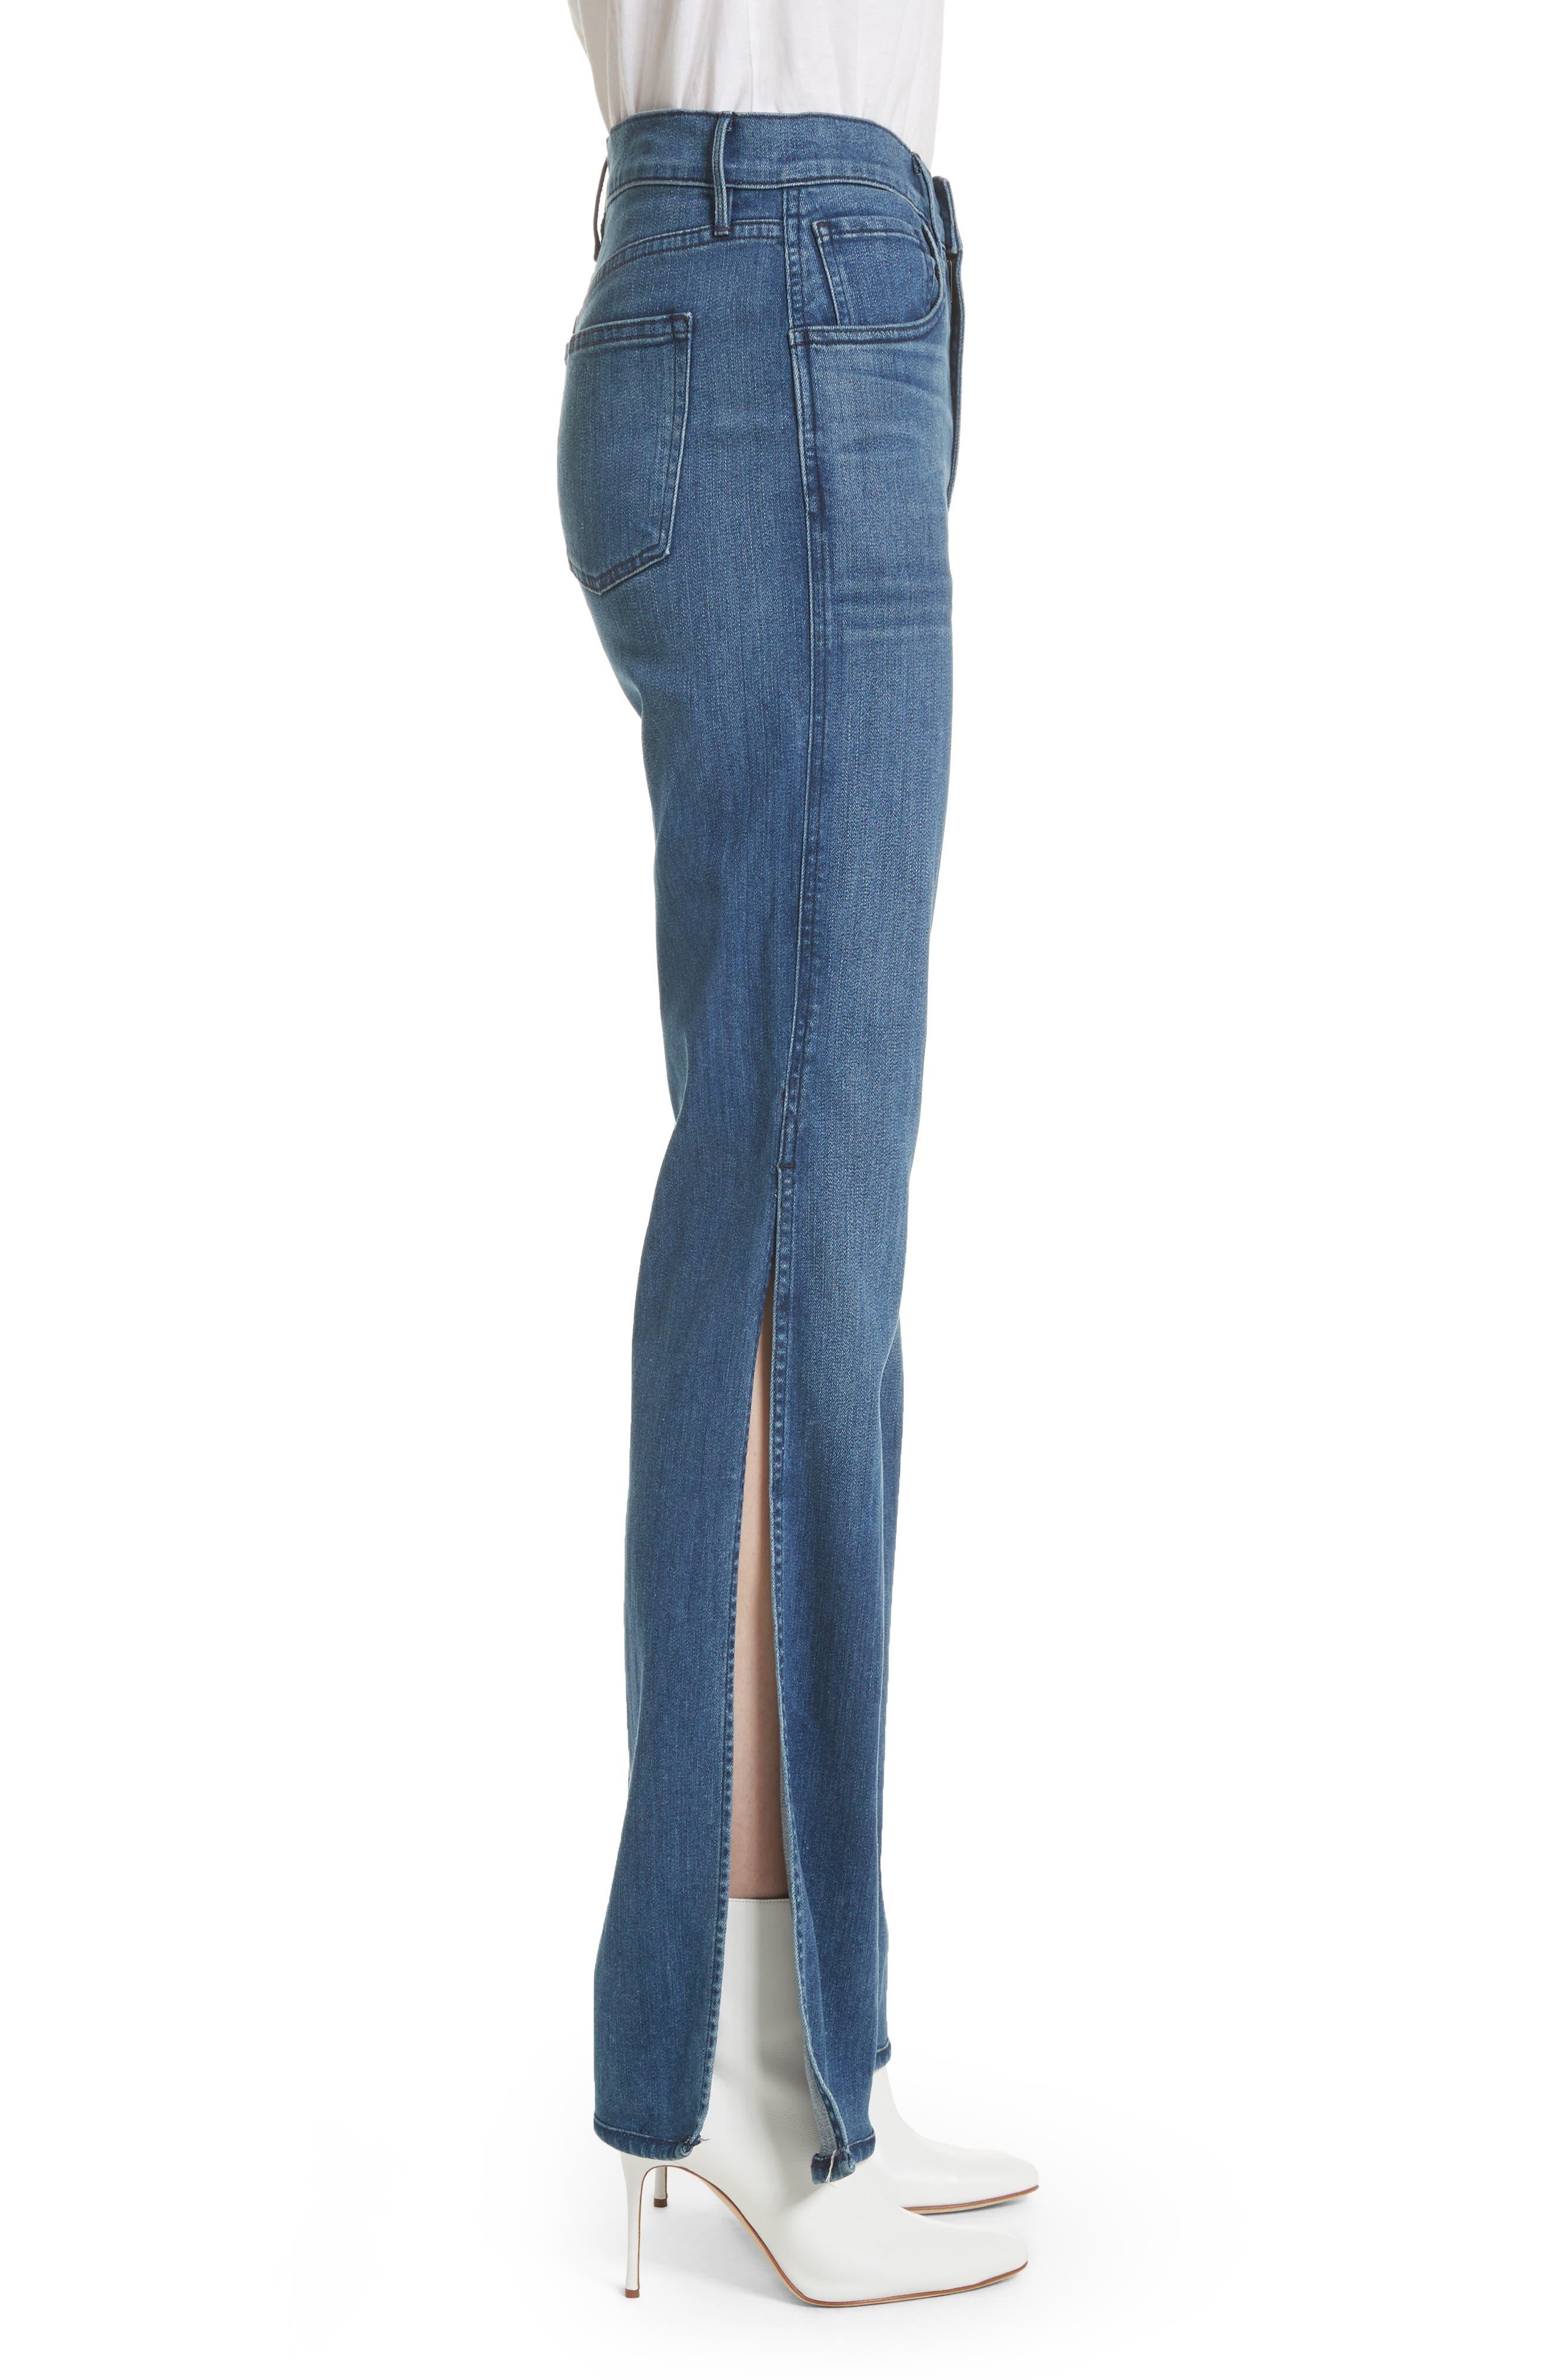 W4 Adeline High Waist Split Flare Jeans,                             Alternate thumbnail 3, color,                             Leia